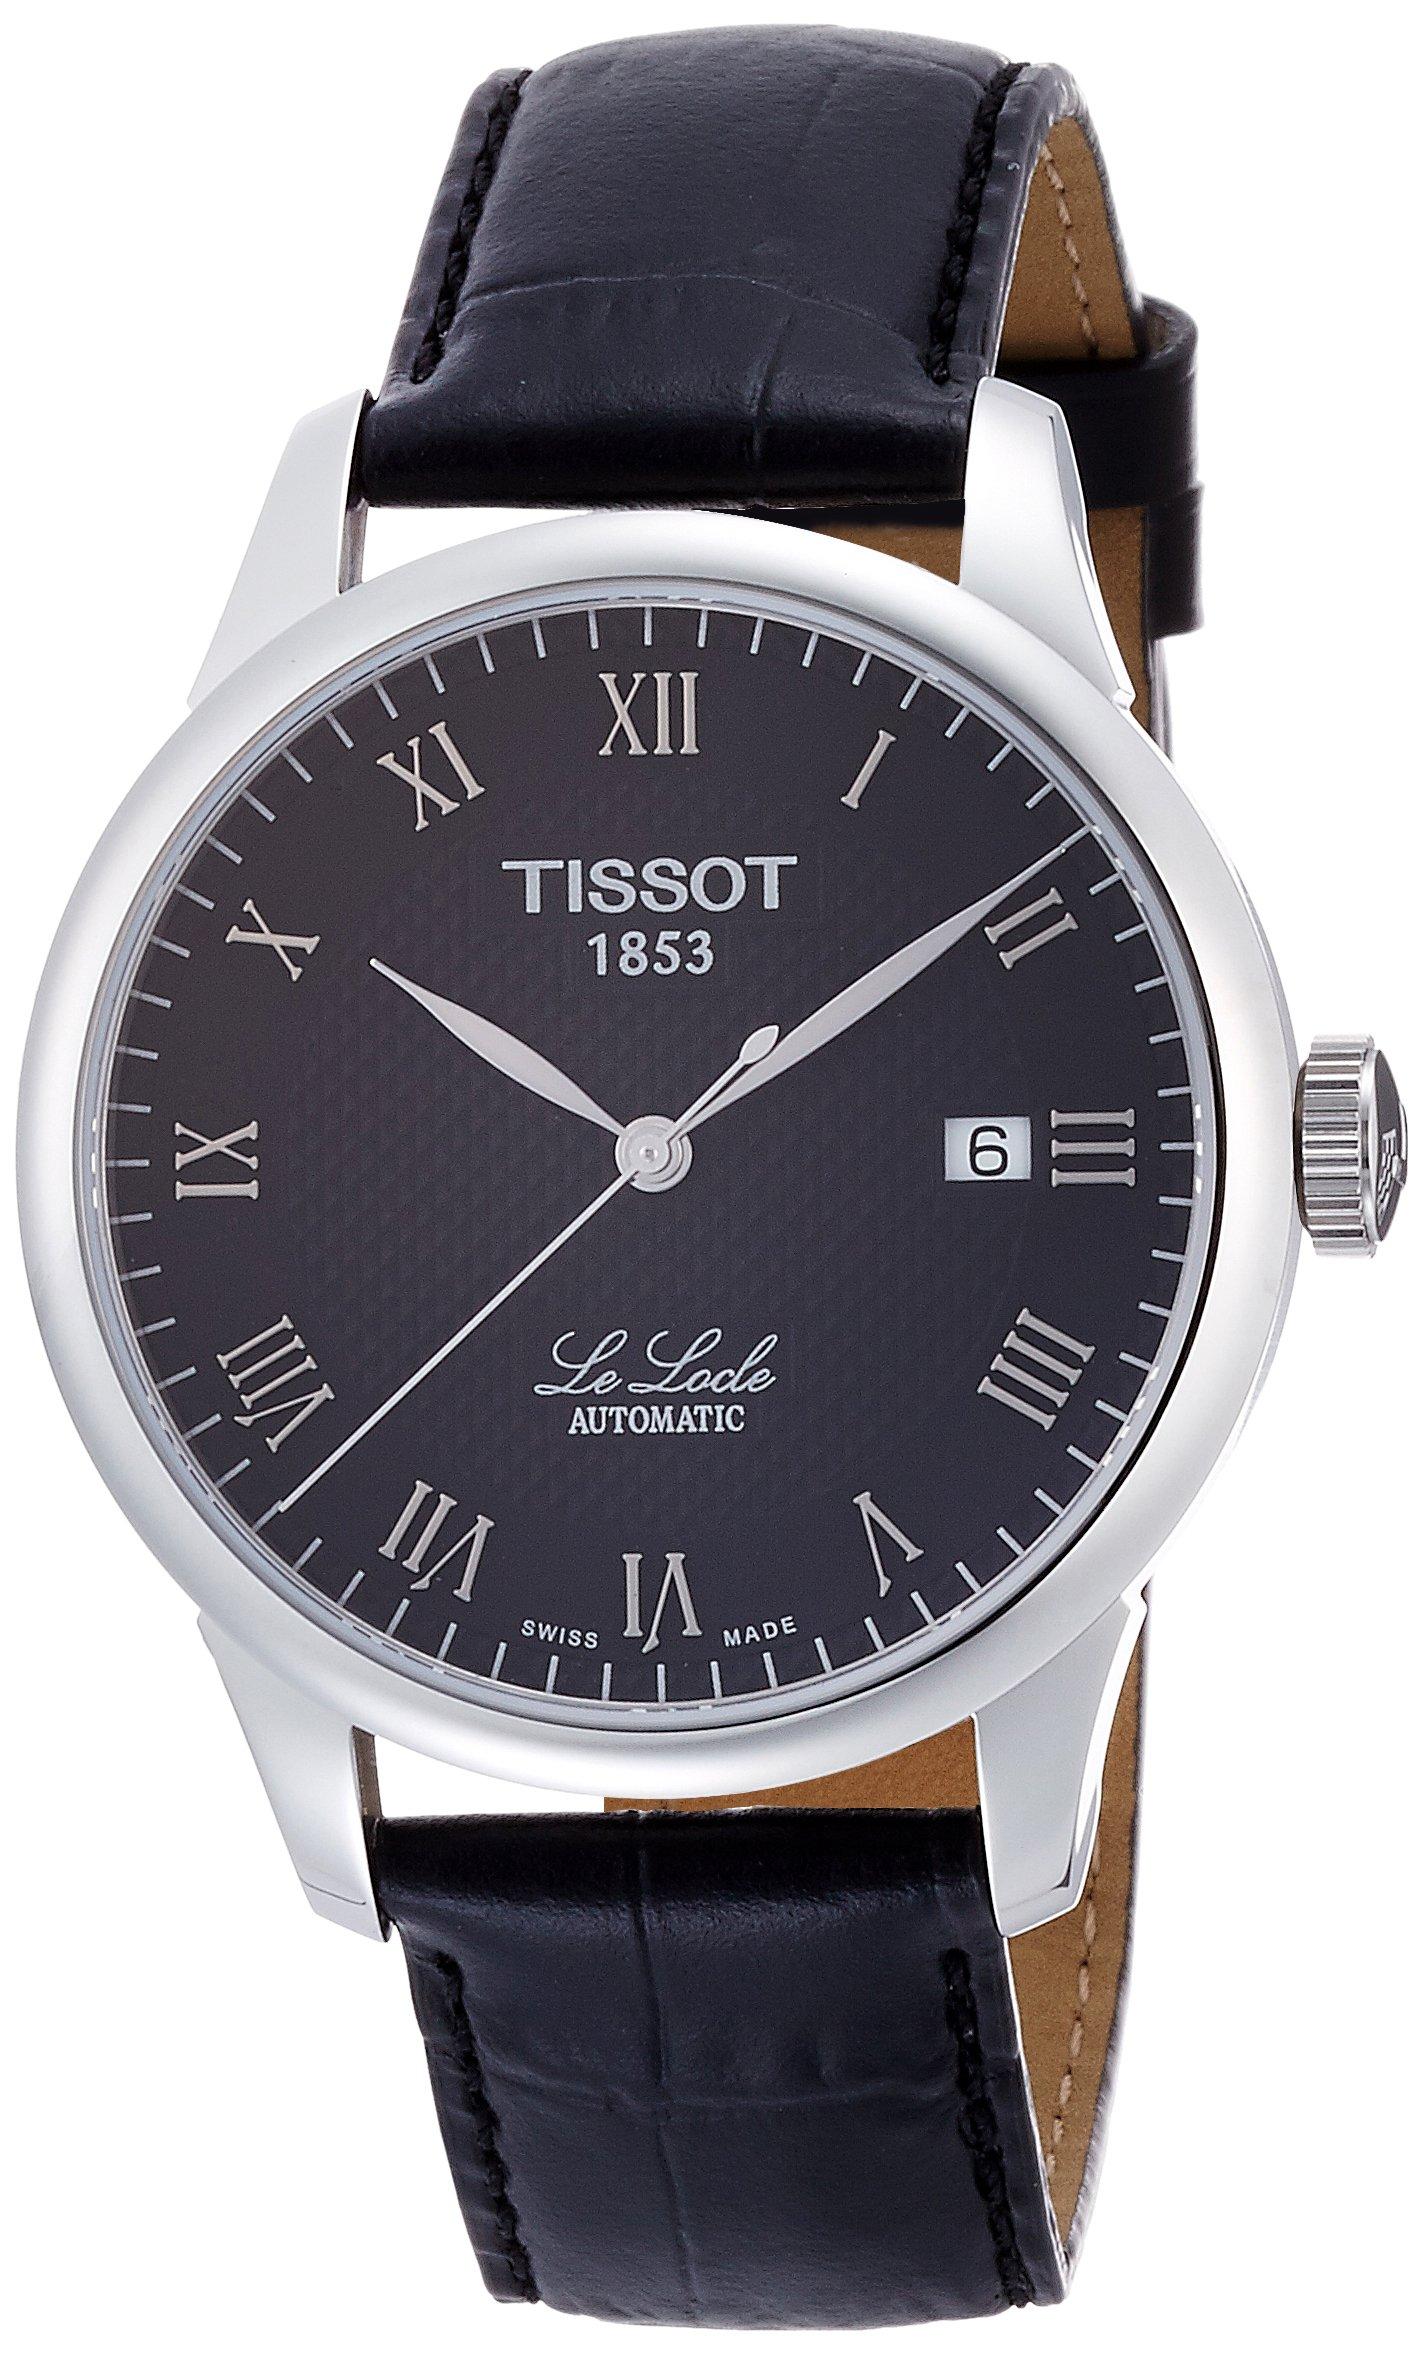 Tissot LE T41142353 – Reloj de caballero de cuarzo, correa de titanio color gris